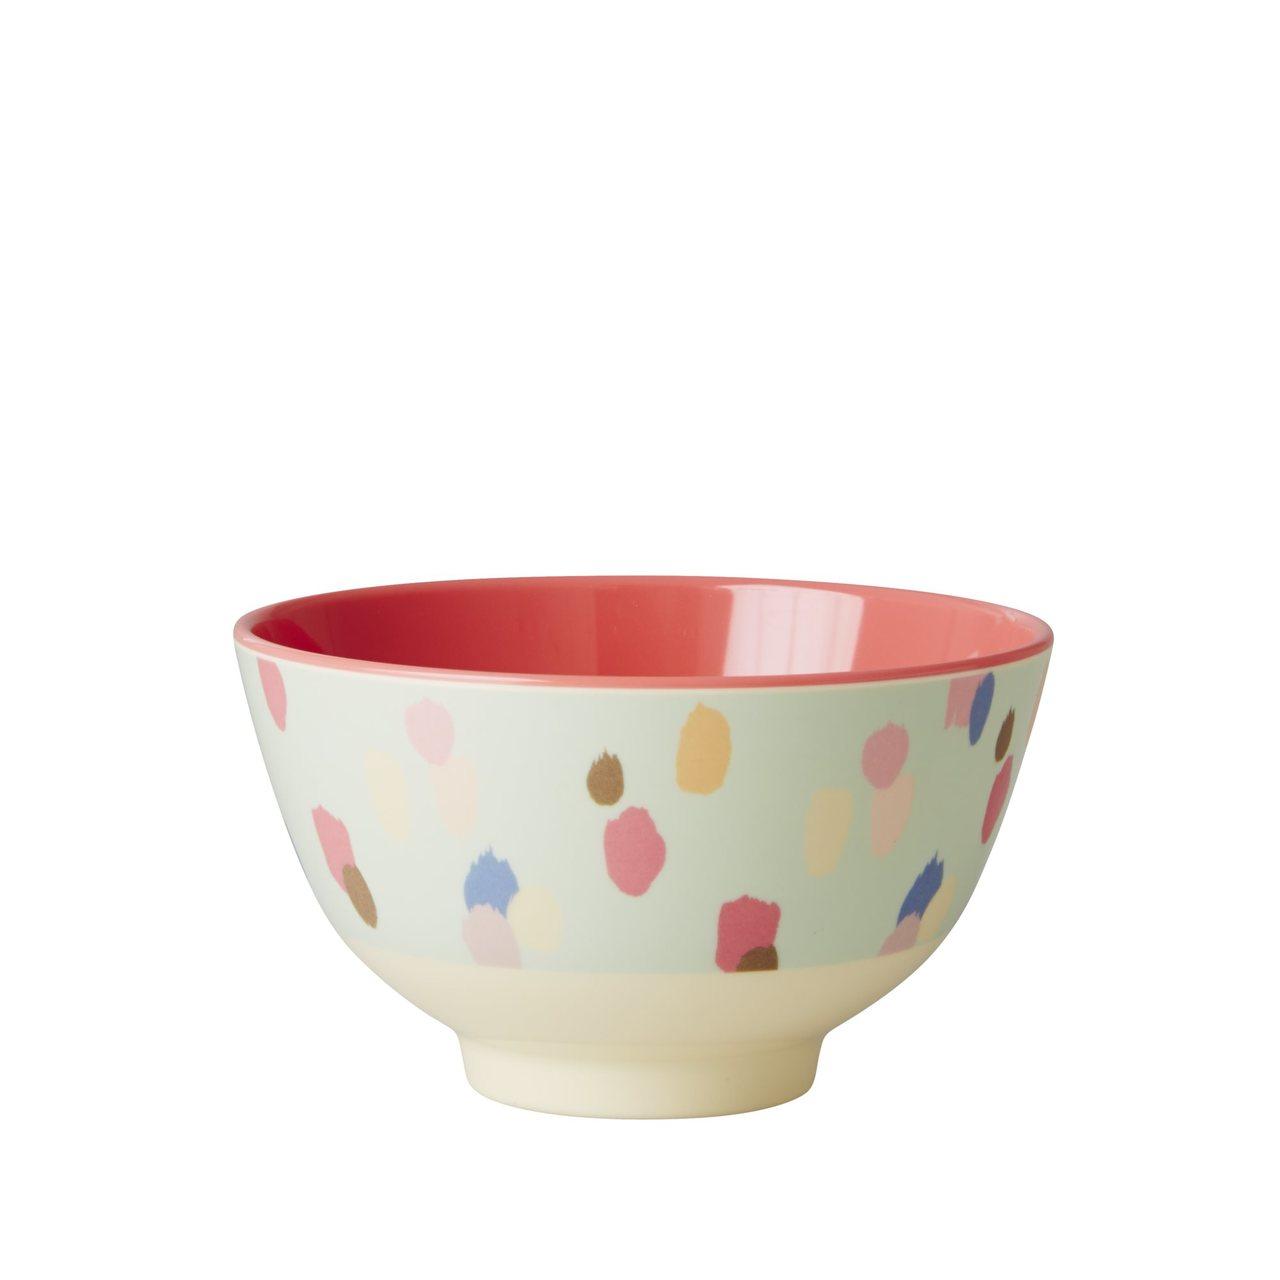 Small Melamine Bowl, Dapper Dot print